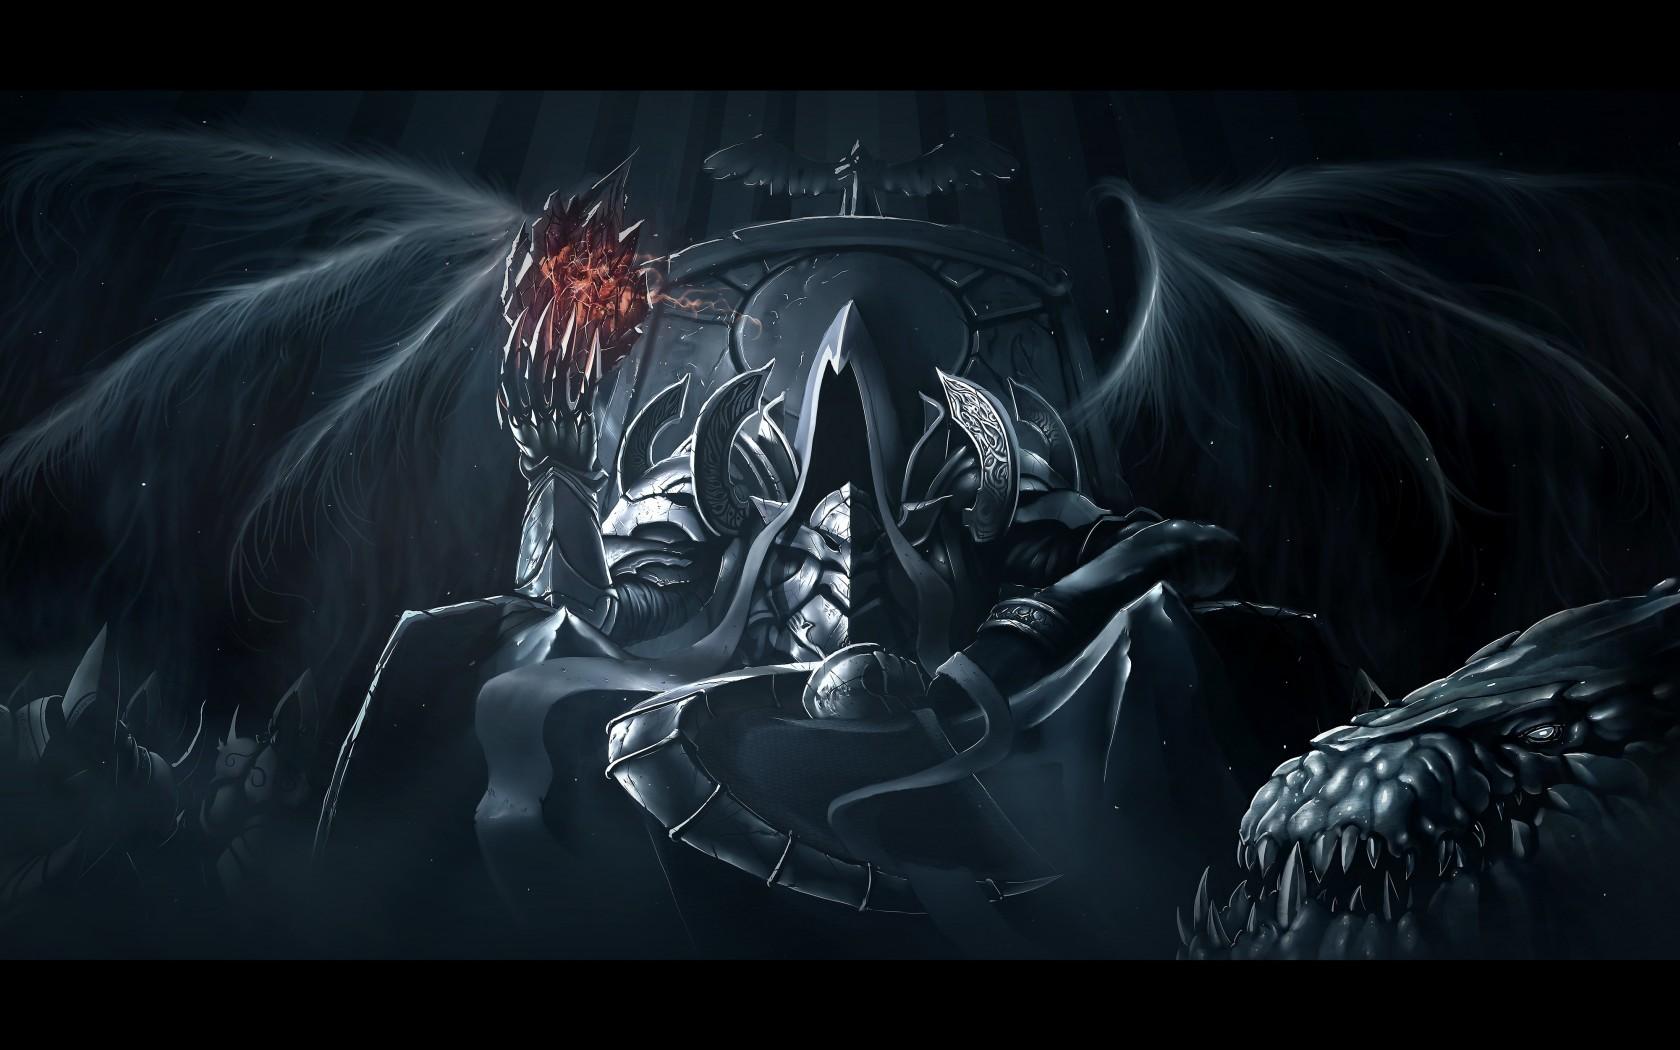 General 1680x1050 Diablo Diablo III fantasy art digital art video games